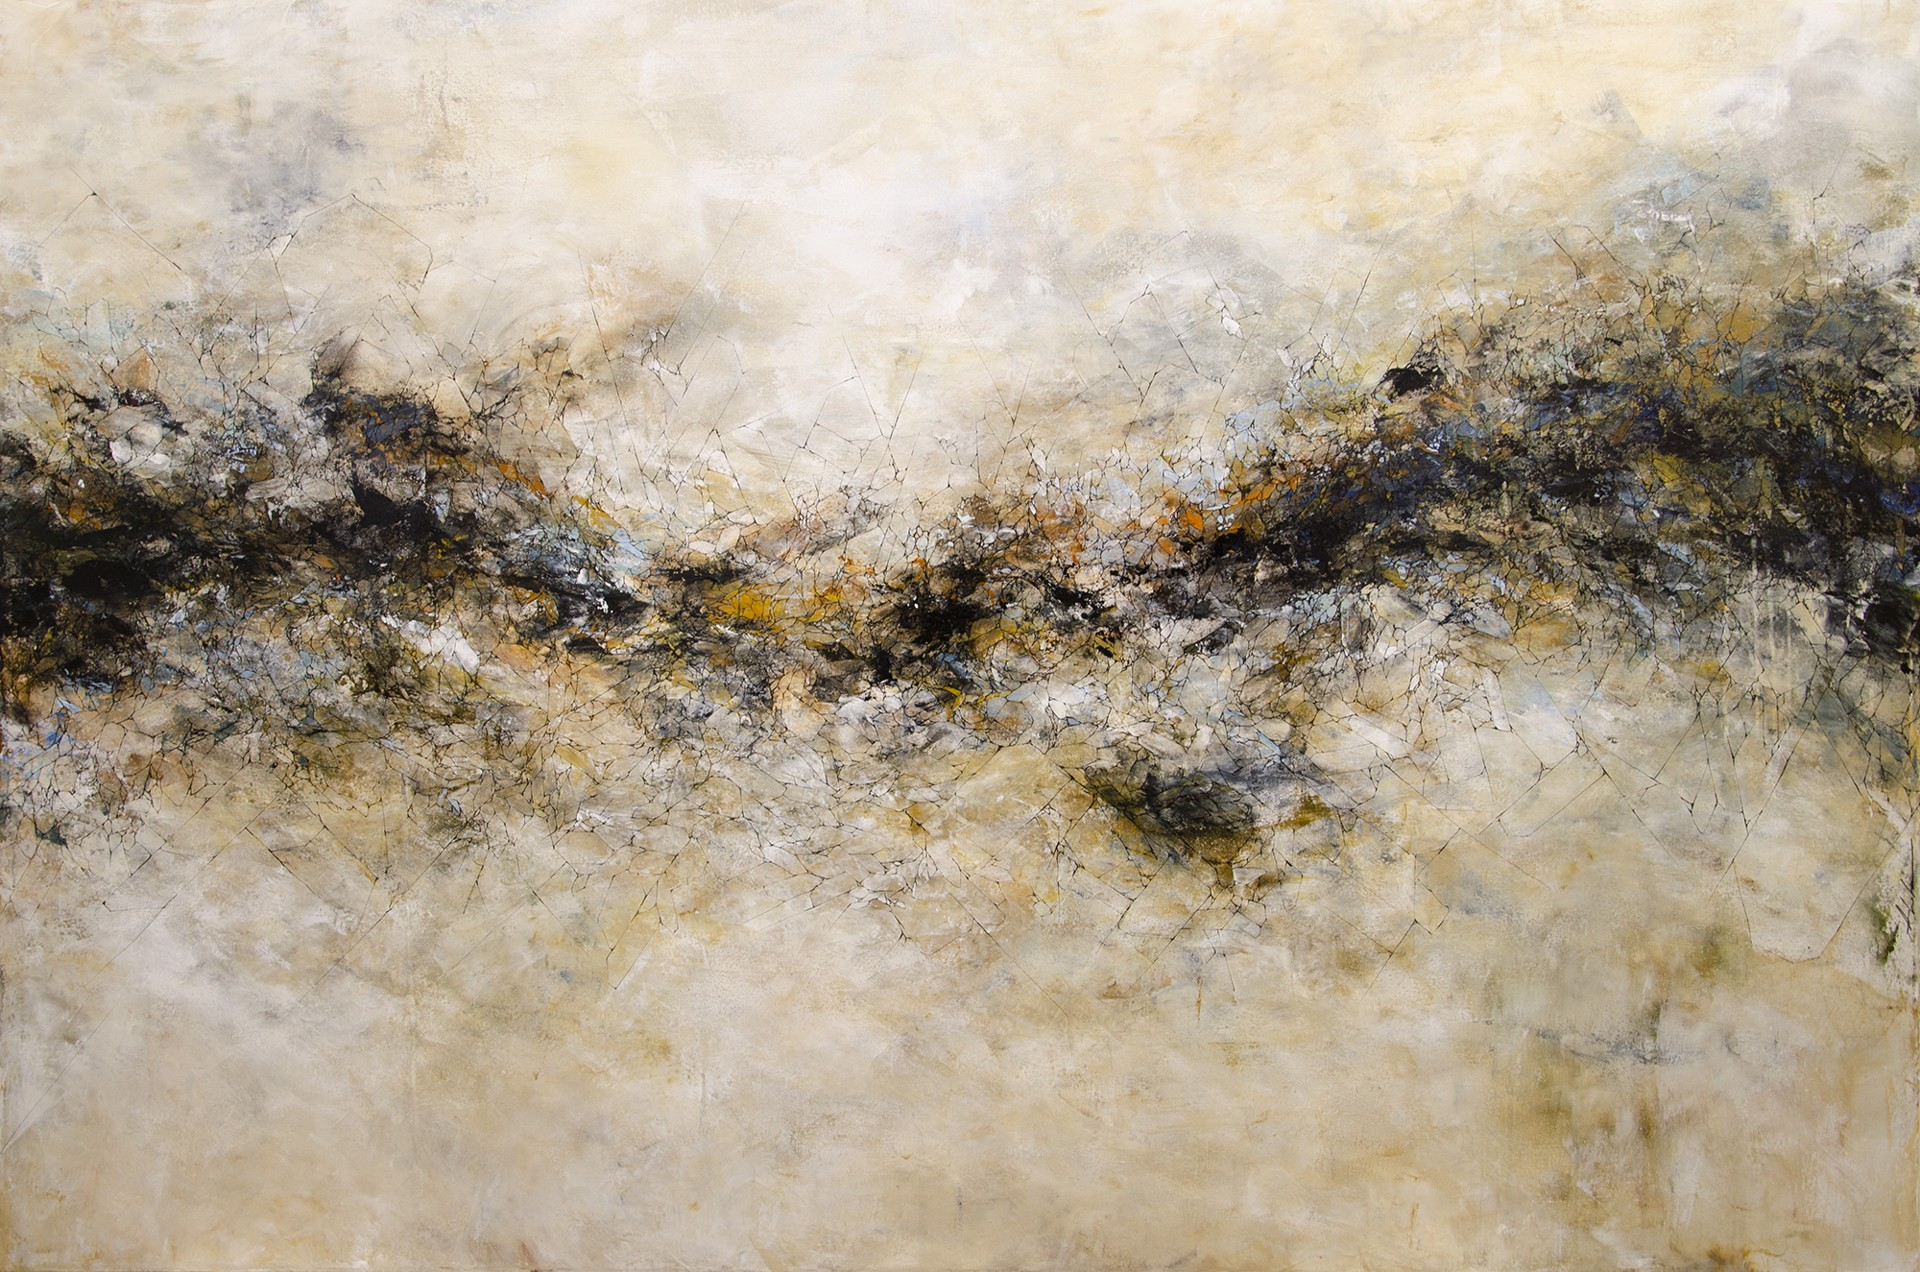 Inclination by Aiden Kringen